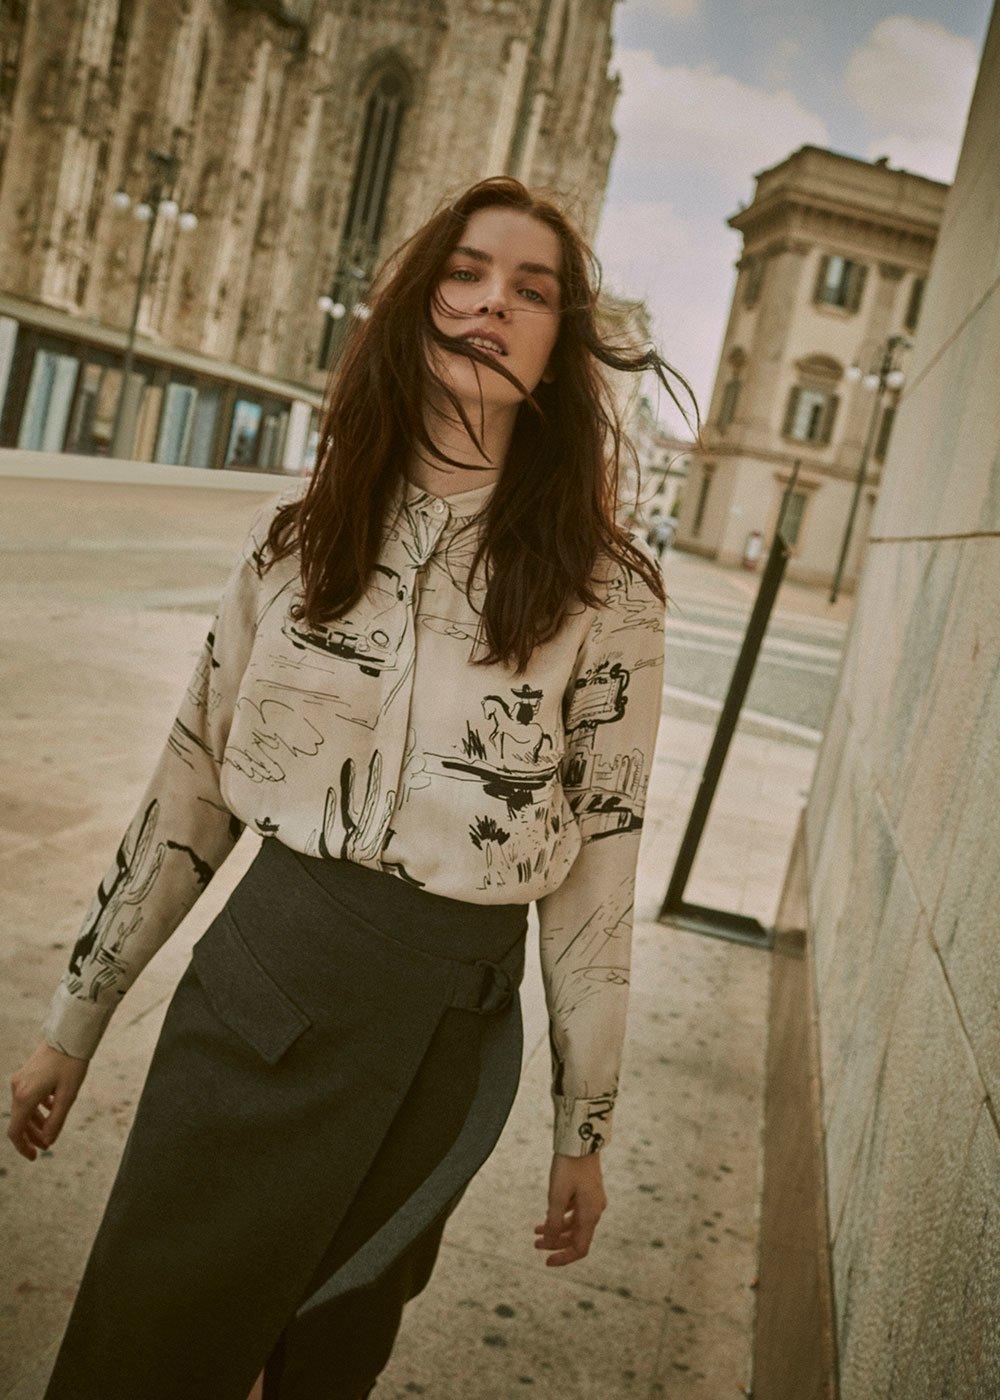 Corinne shirt with comic strip pattern - Luna\ Black Fantasia - Woman